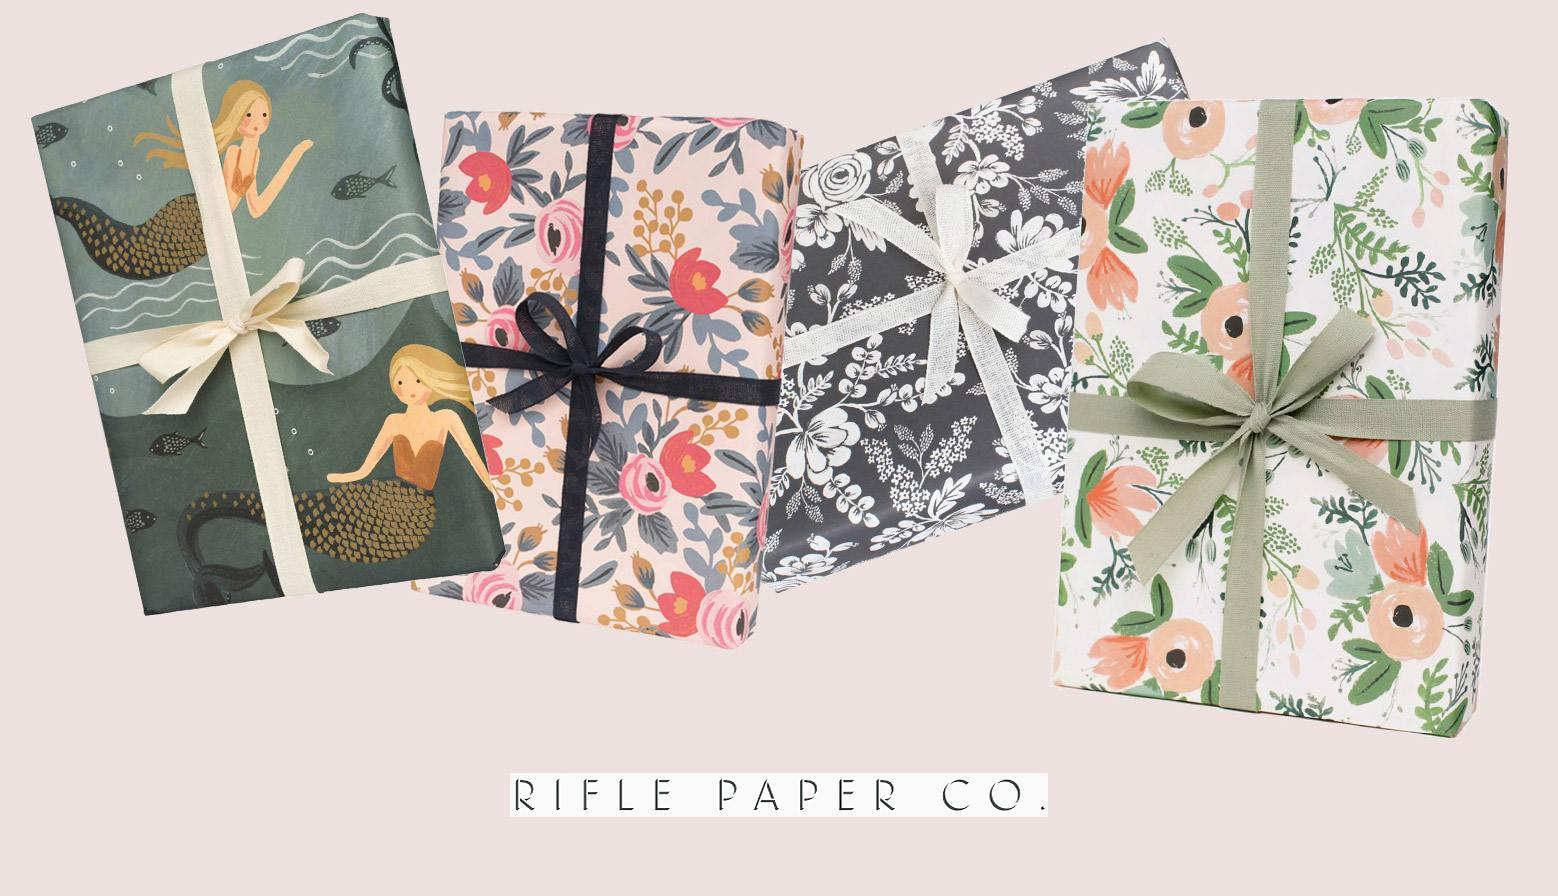 rifle paper co papeterie wunderschoen-gemacht